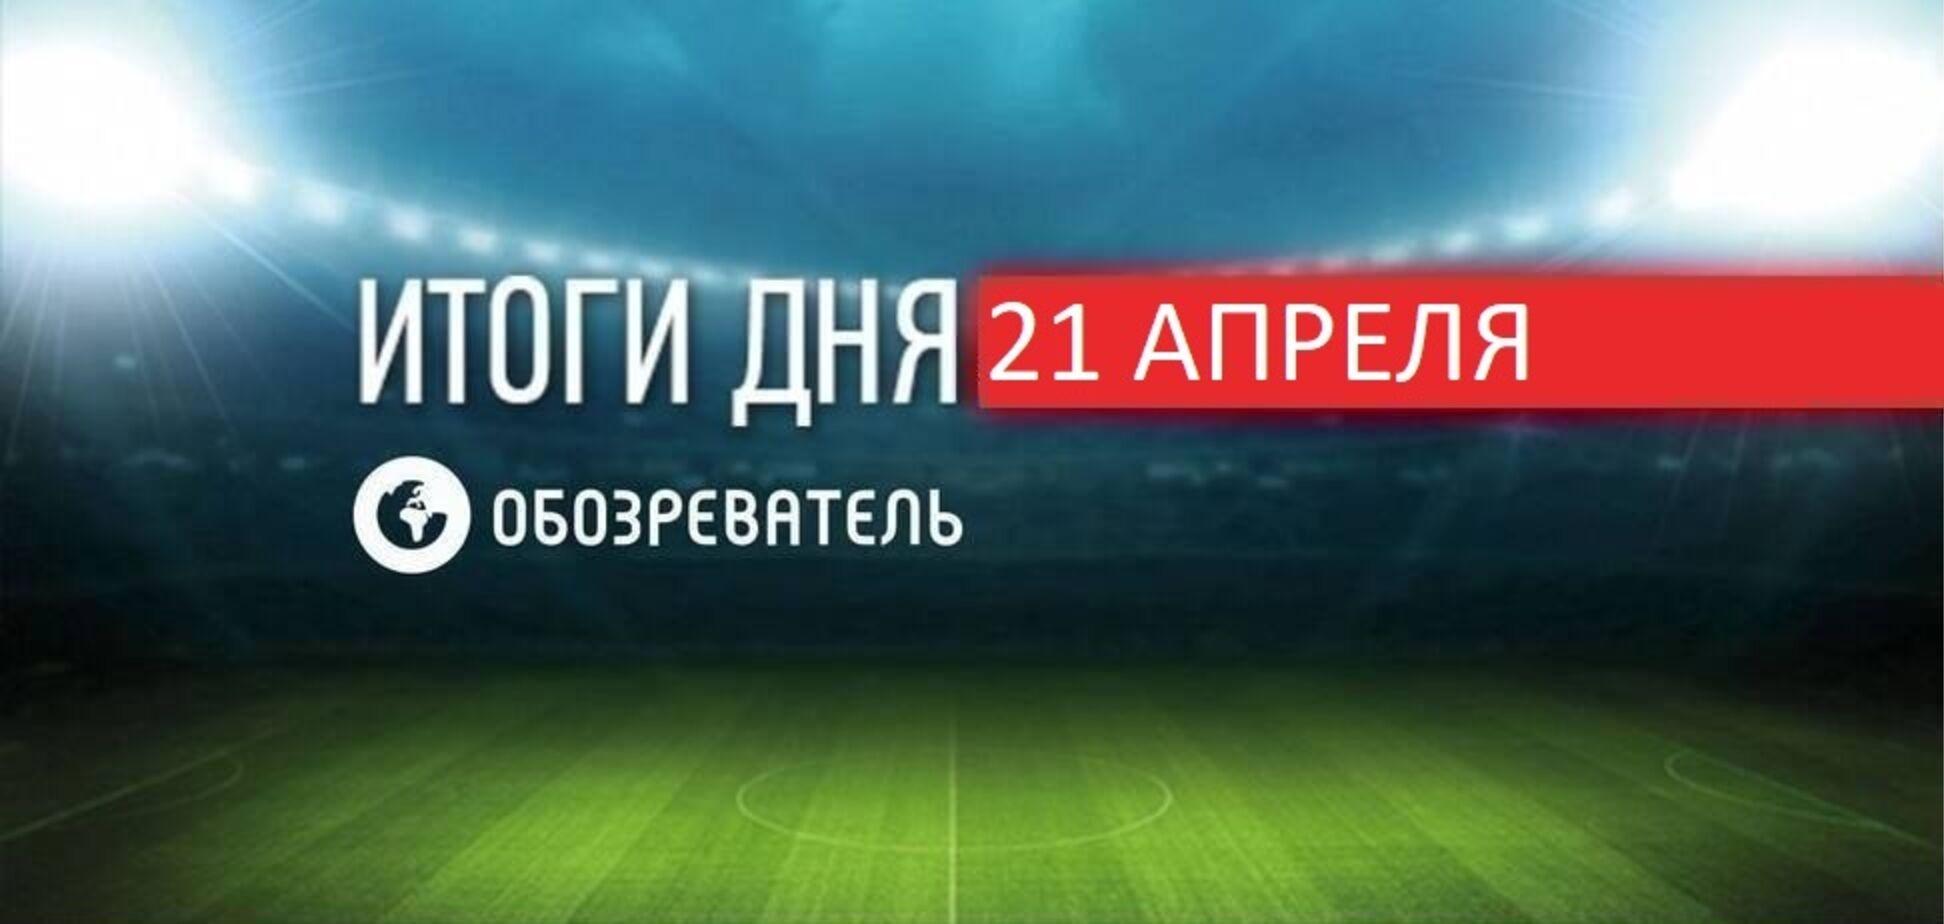 Новости спорта 21 апреля: Бущан устроил матерную перепалку с ультрас 'Динамо'